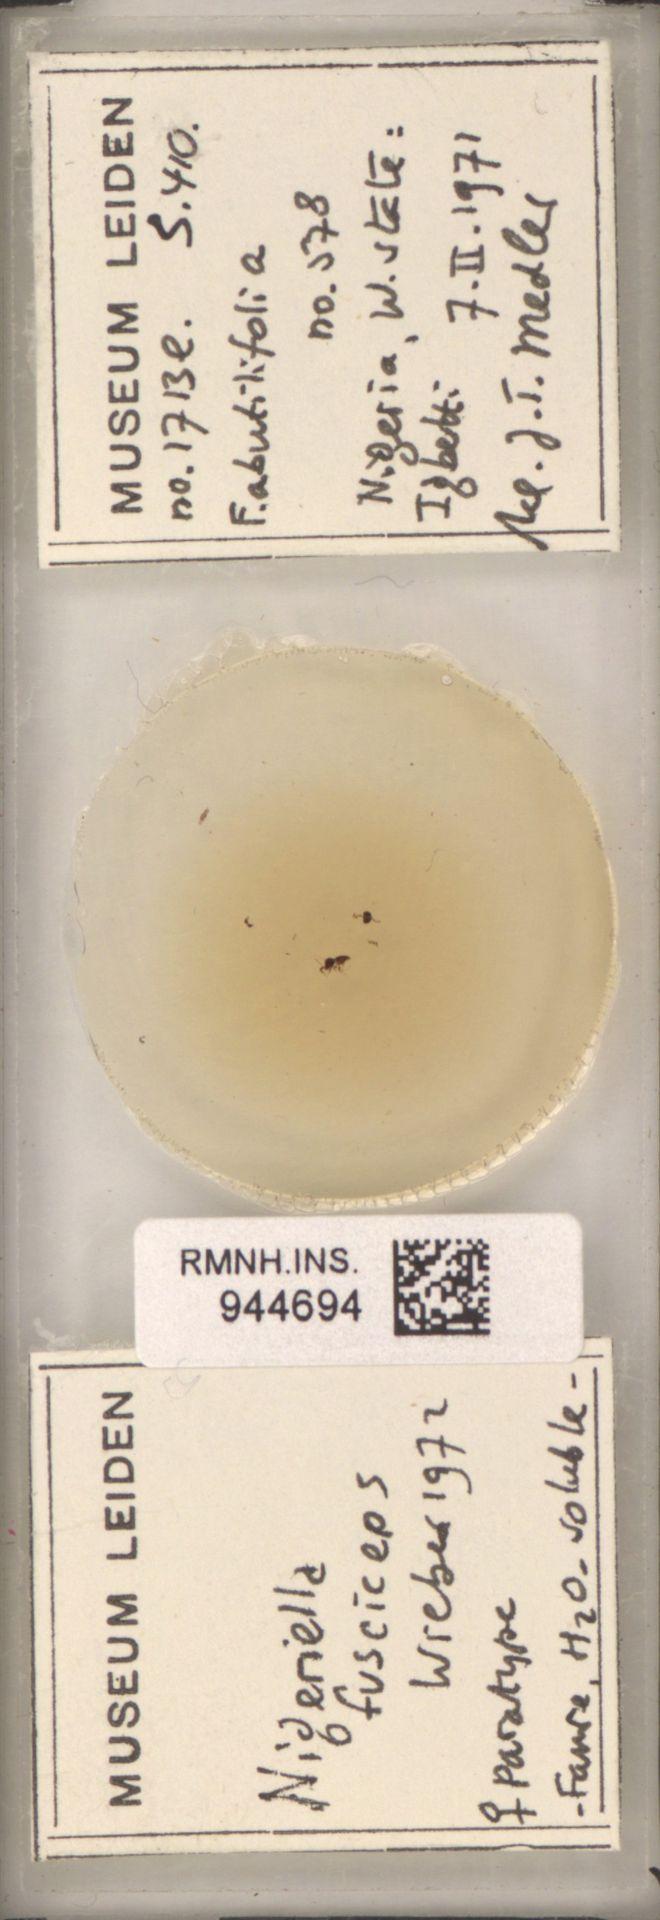 RMNH.INS.944694 | Nigeriella fusciceps Wiebes, 1972